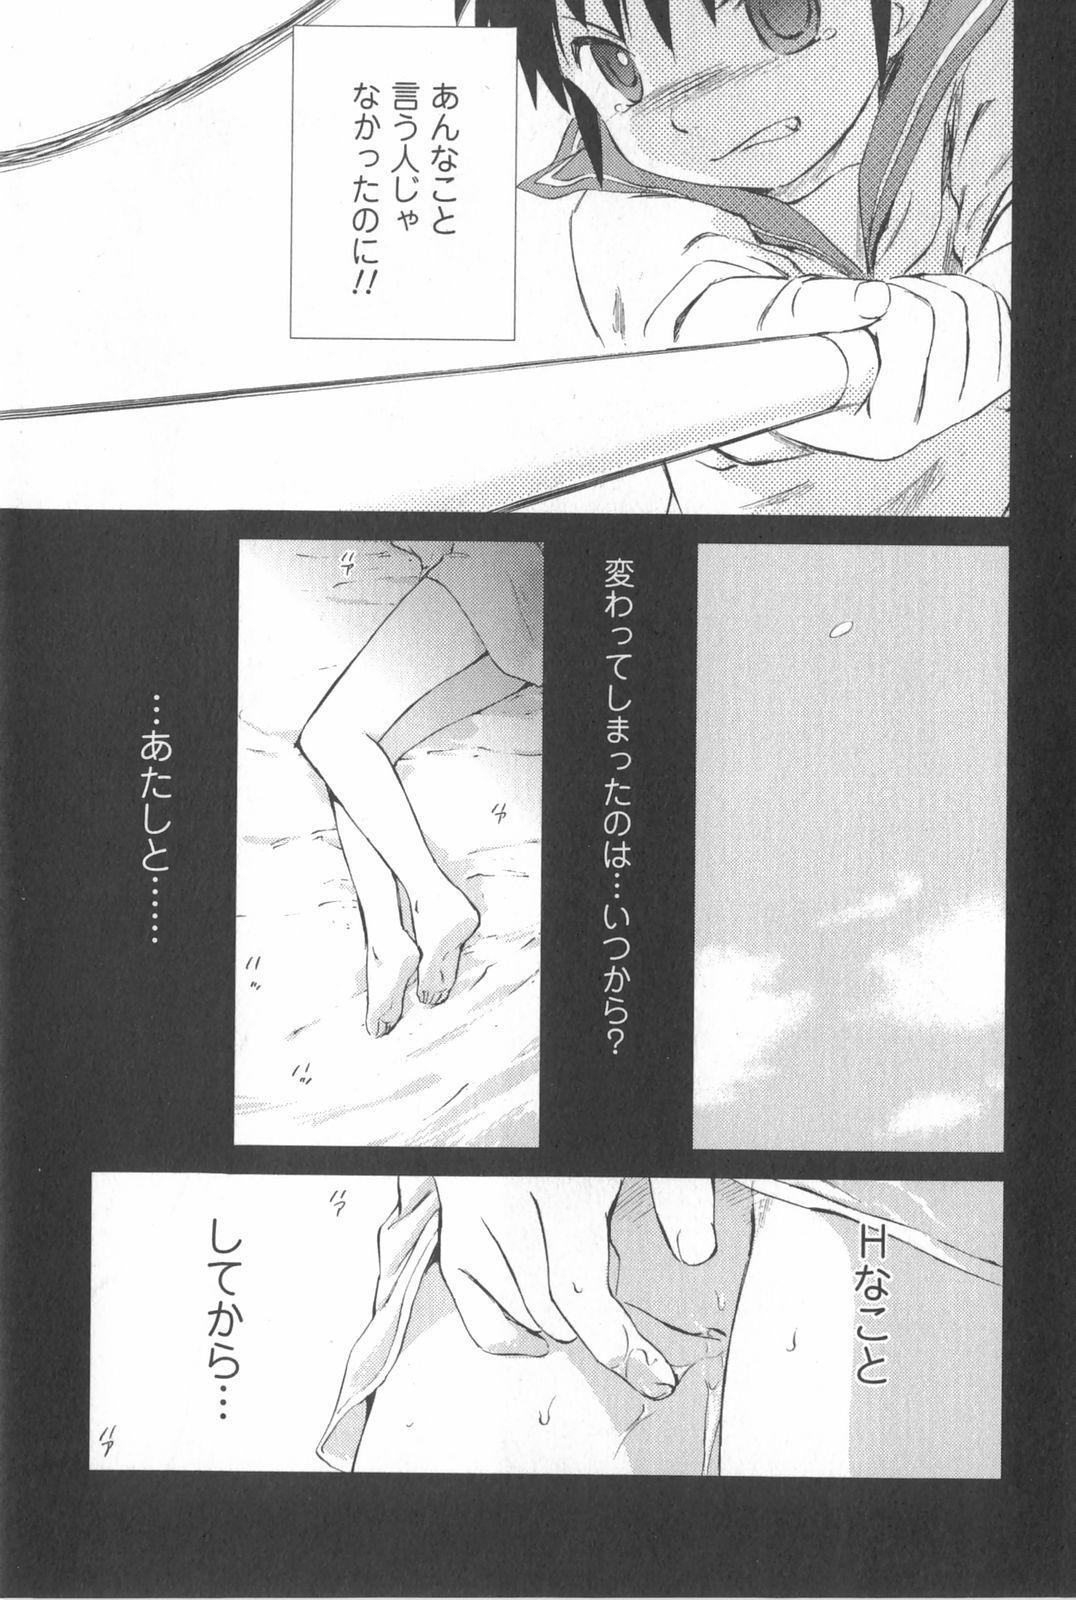 Momoiro Peanuts Vol. 2 164